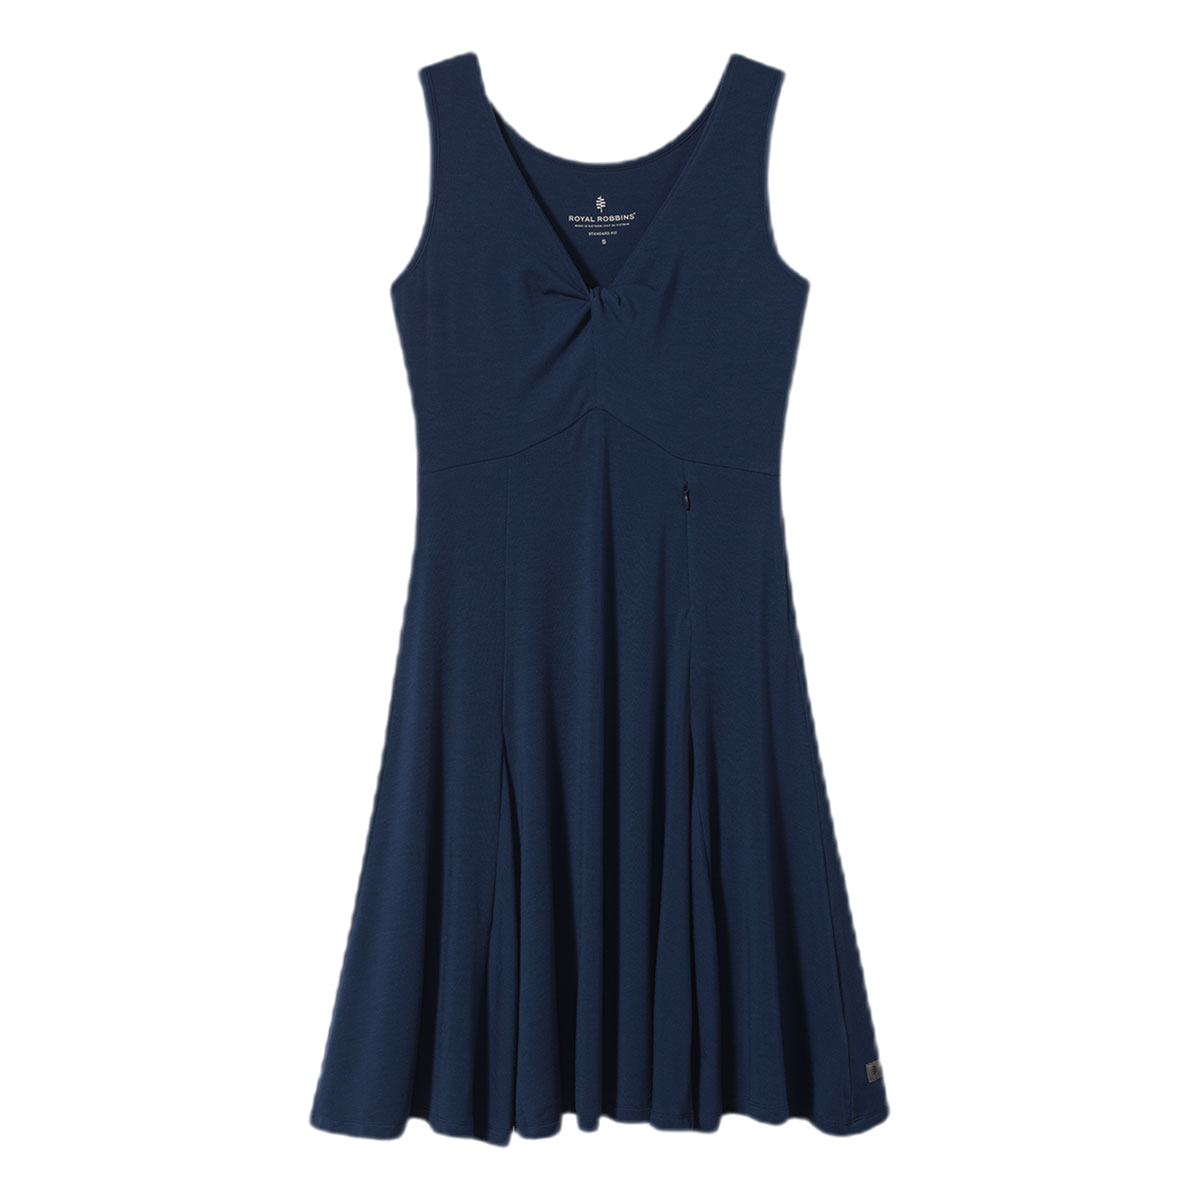 Essential tencel dress